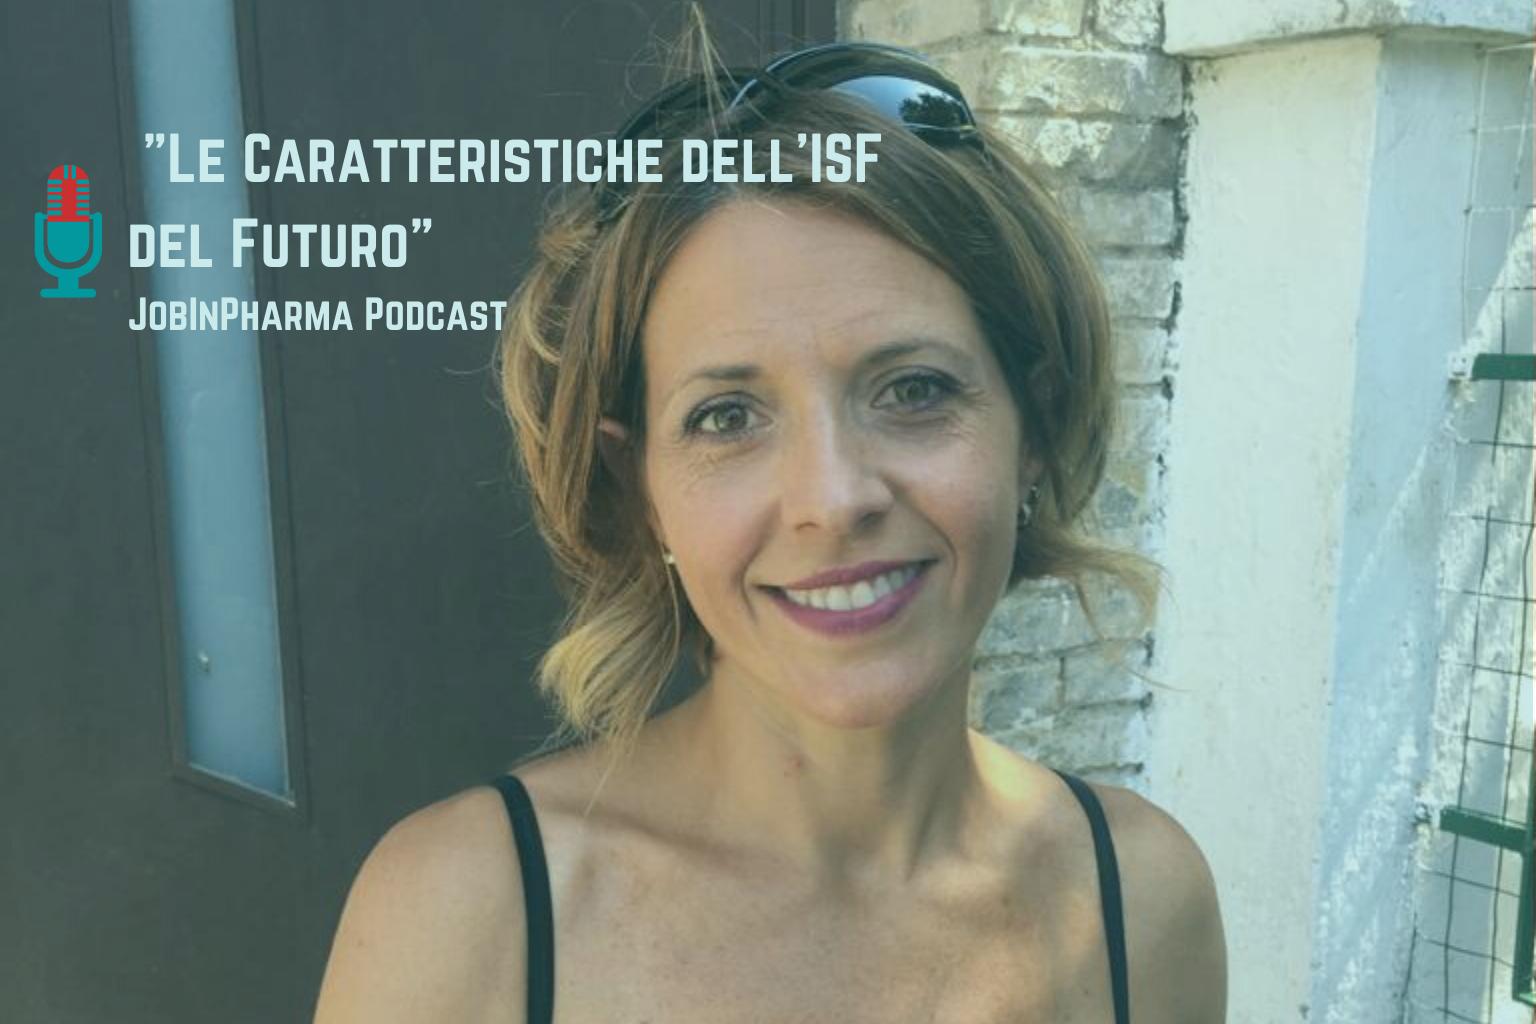 _jobinpharma podcastisf del futuro labbate